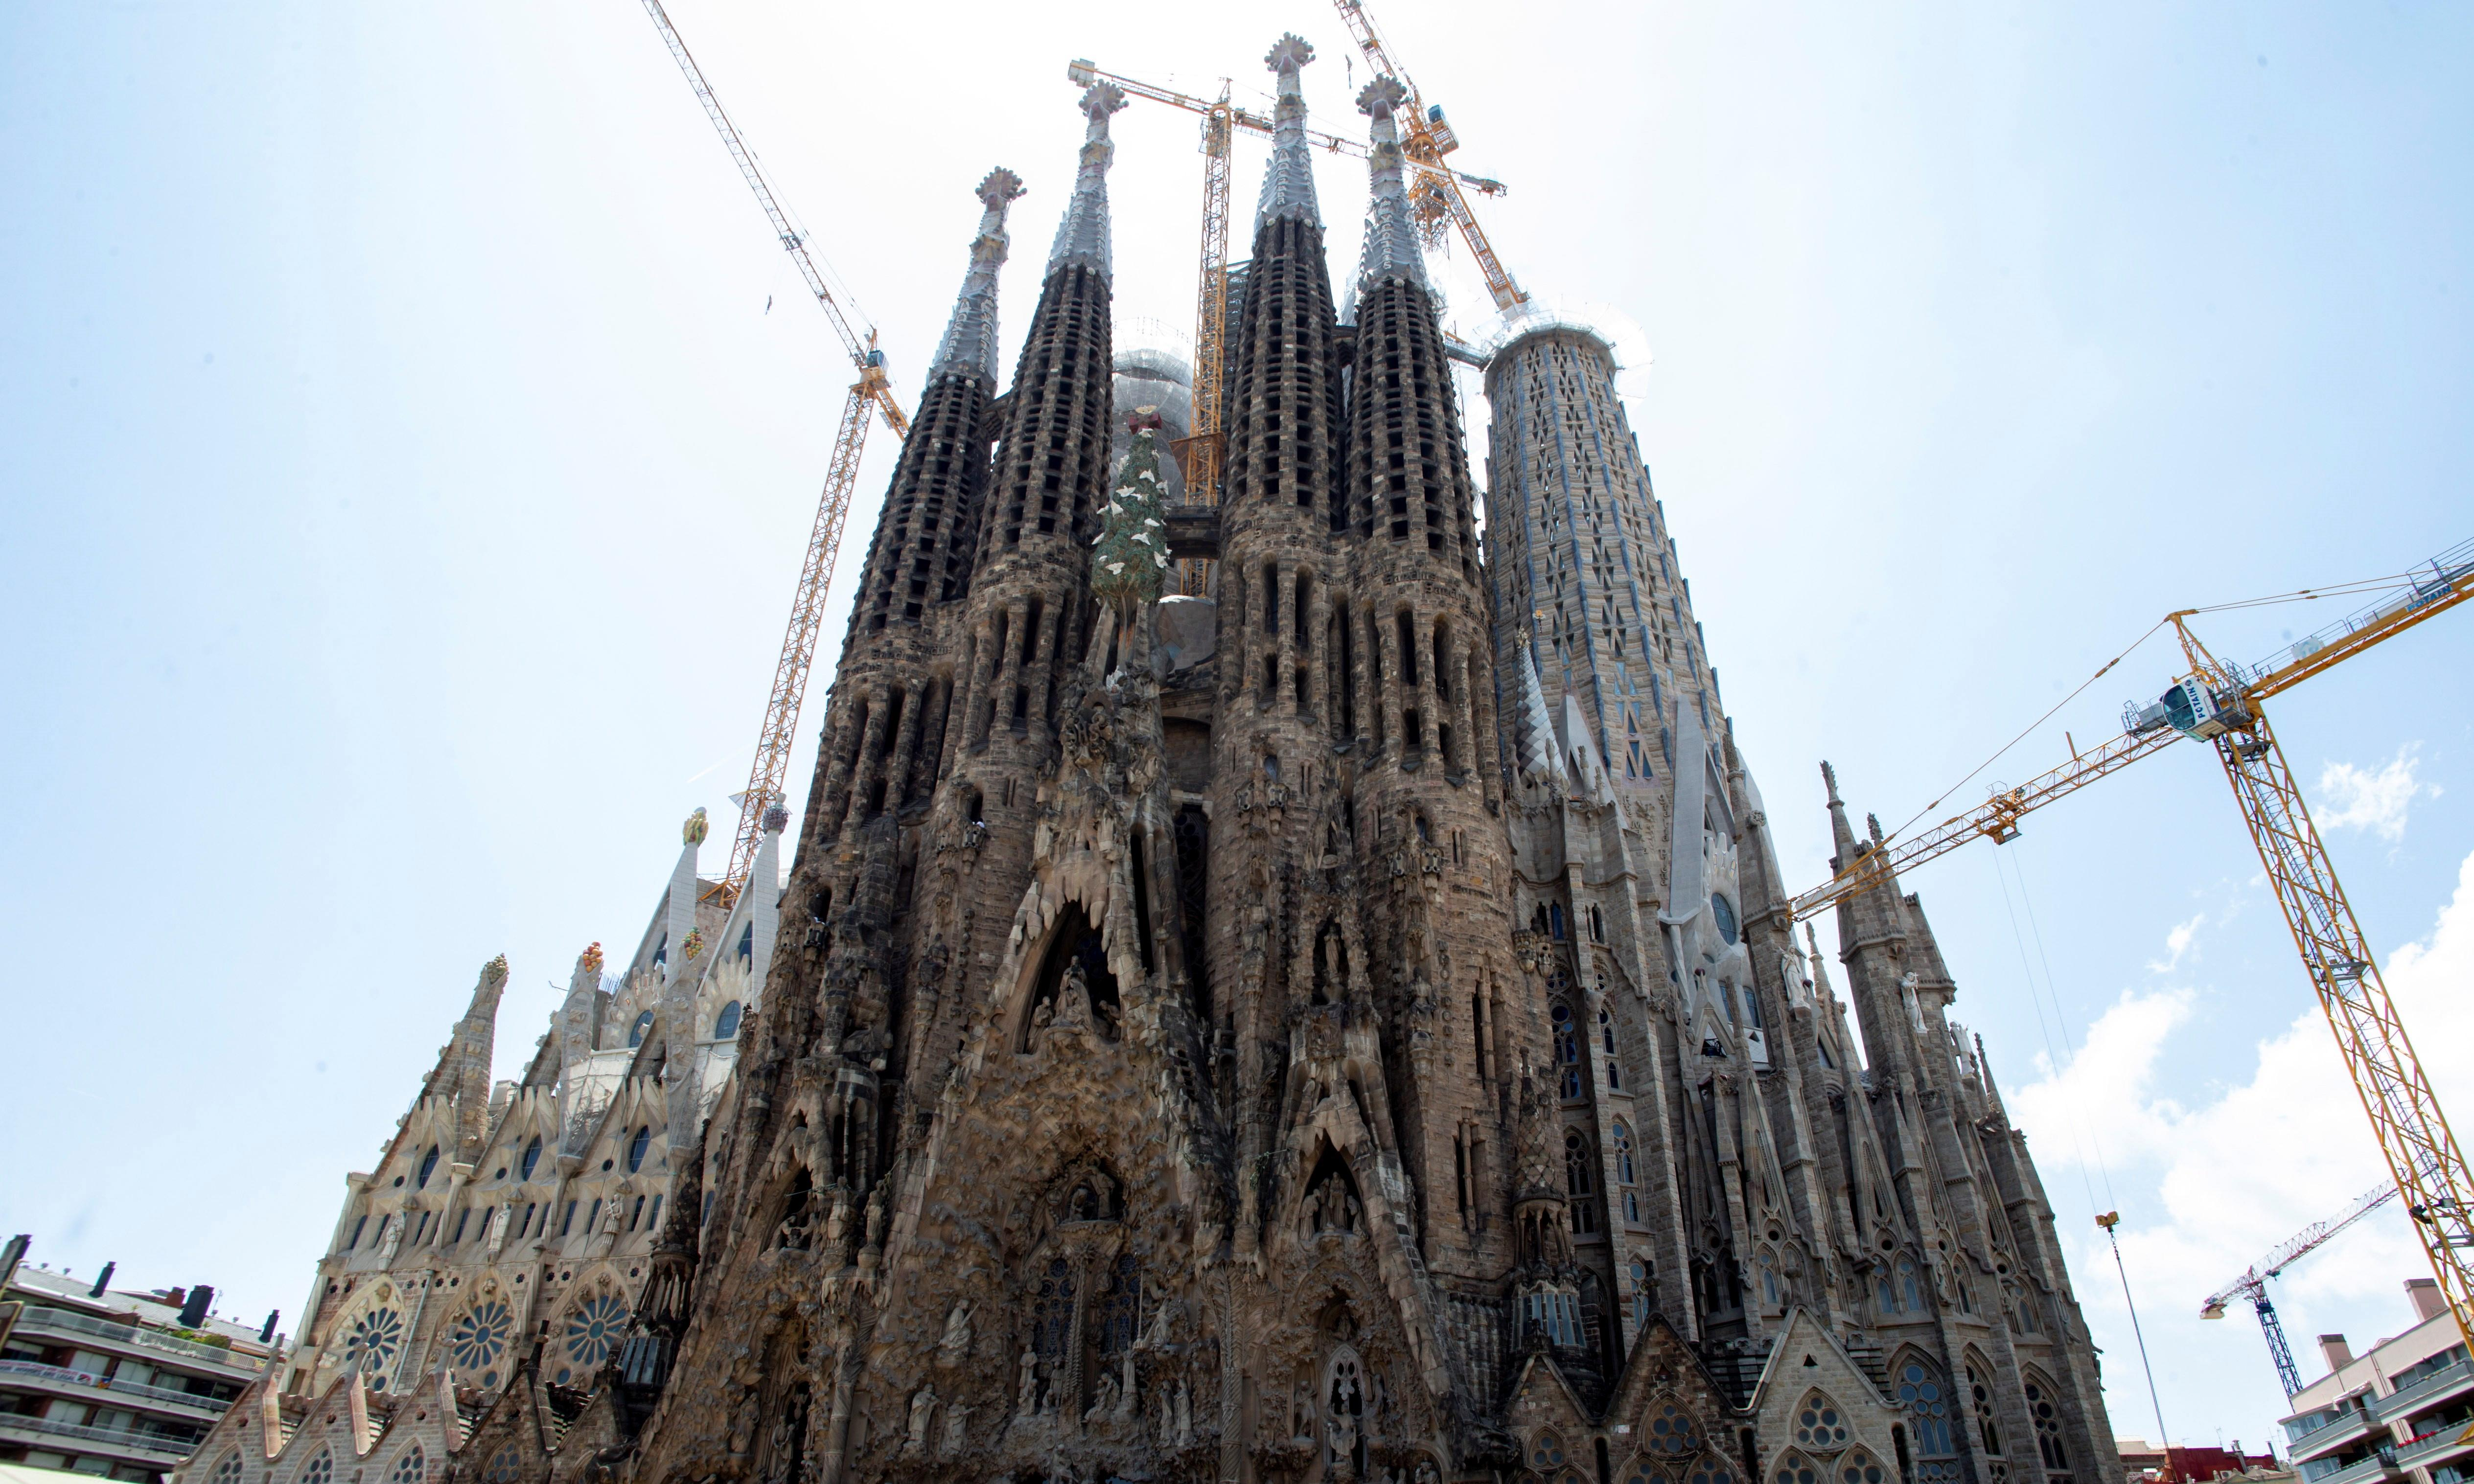 Gaudí's Sagrada Família wins a building permit – 137 years after work began